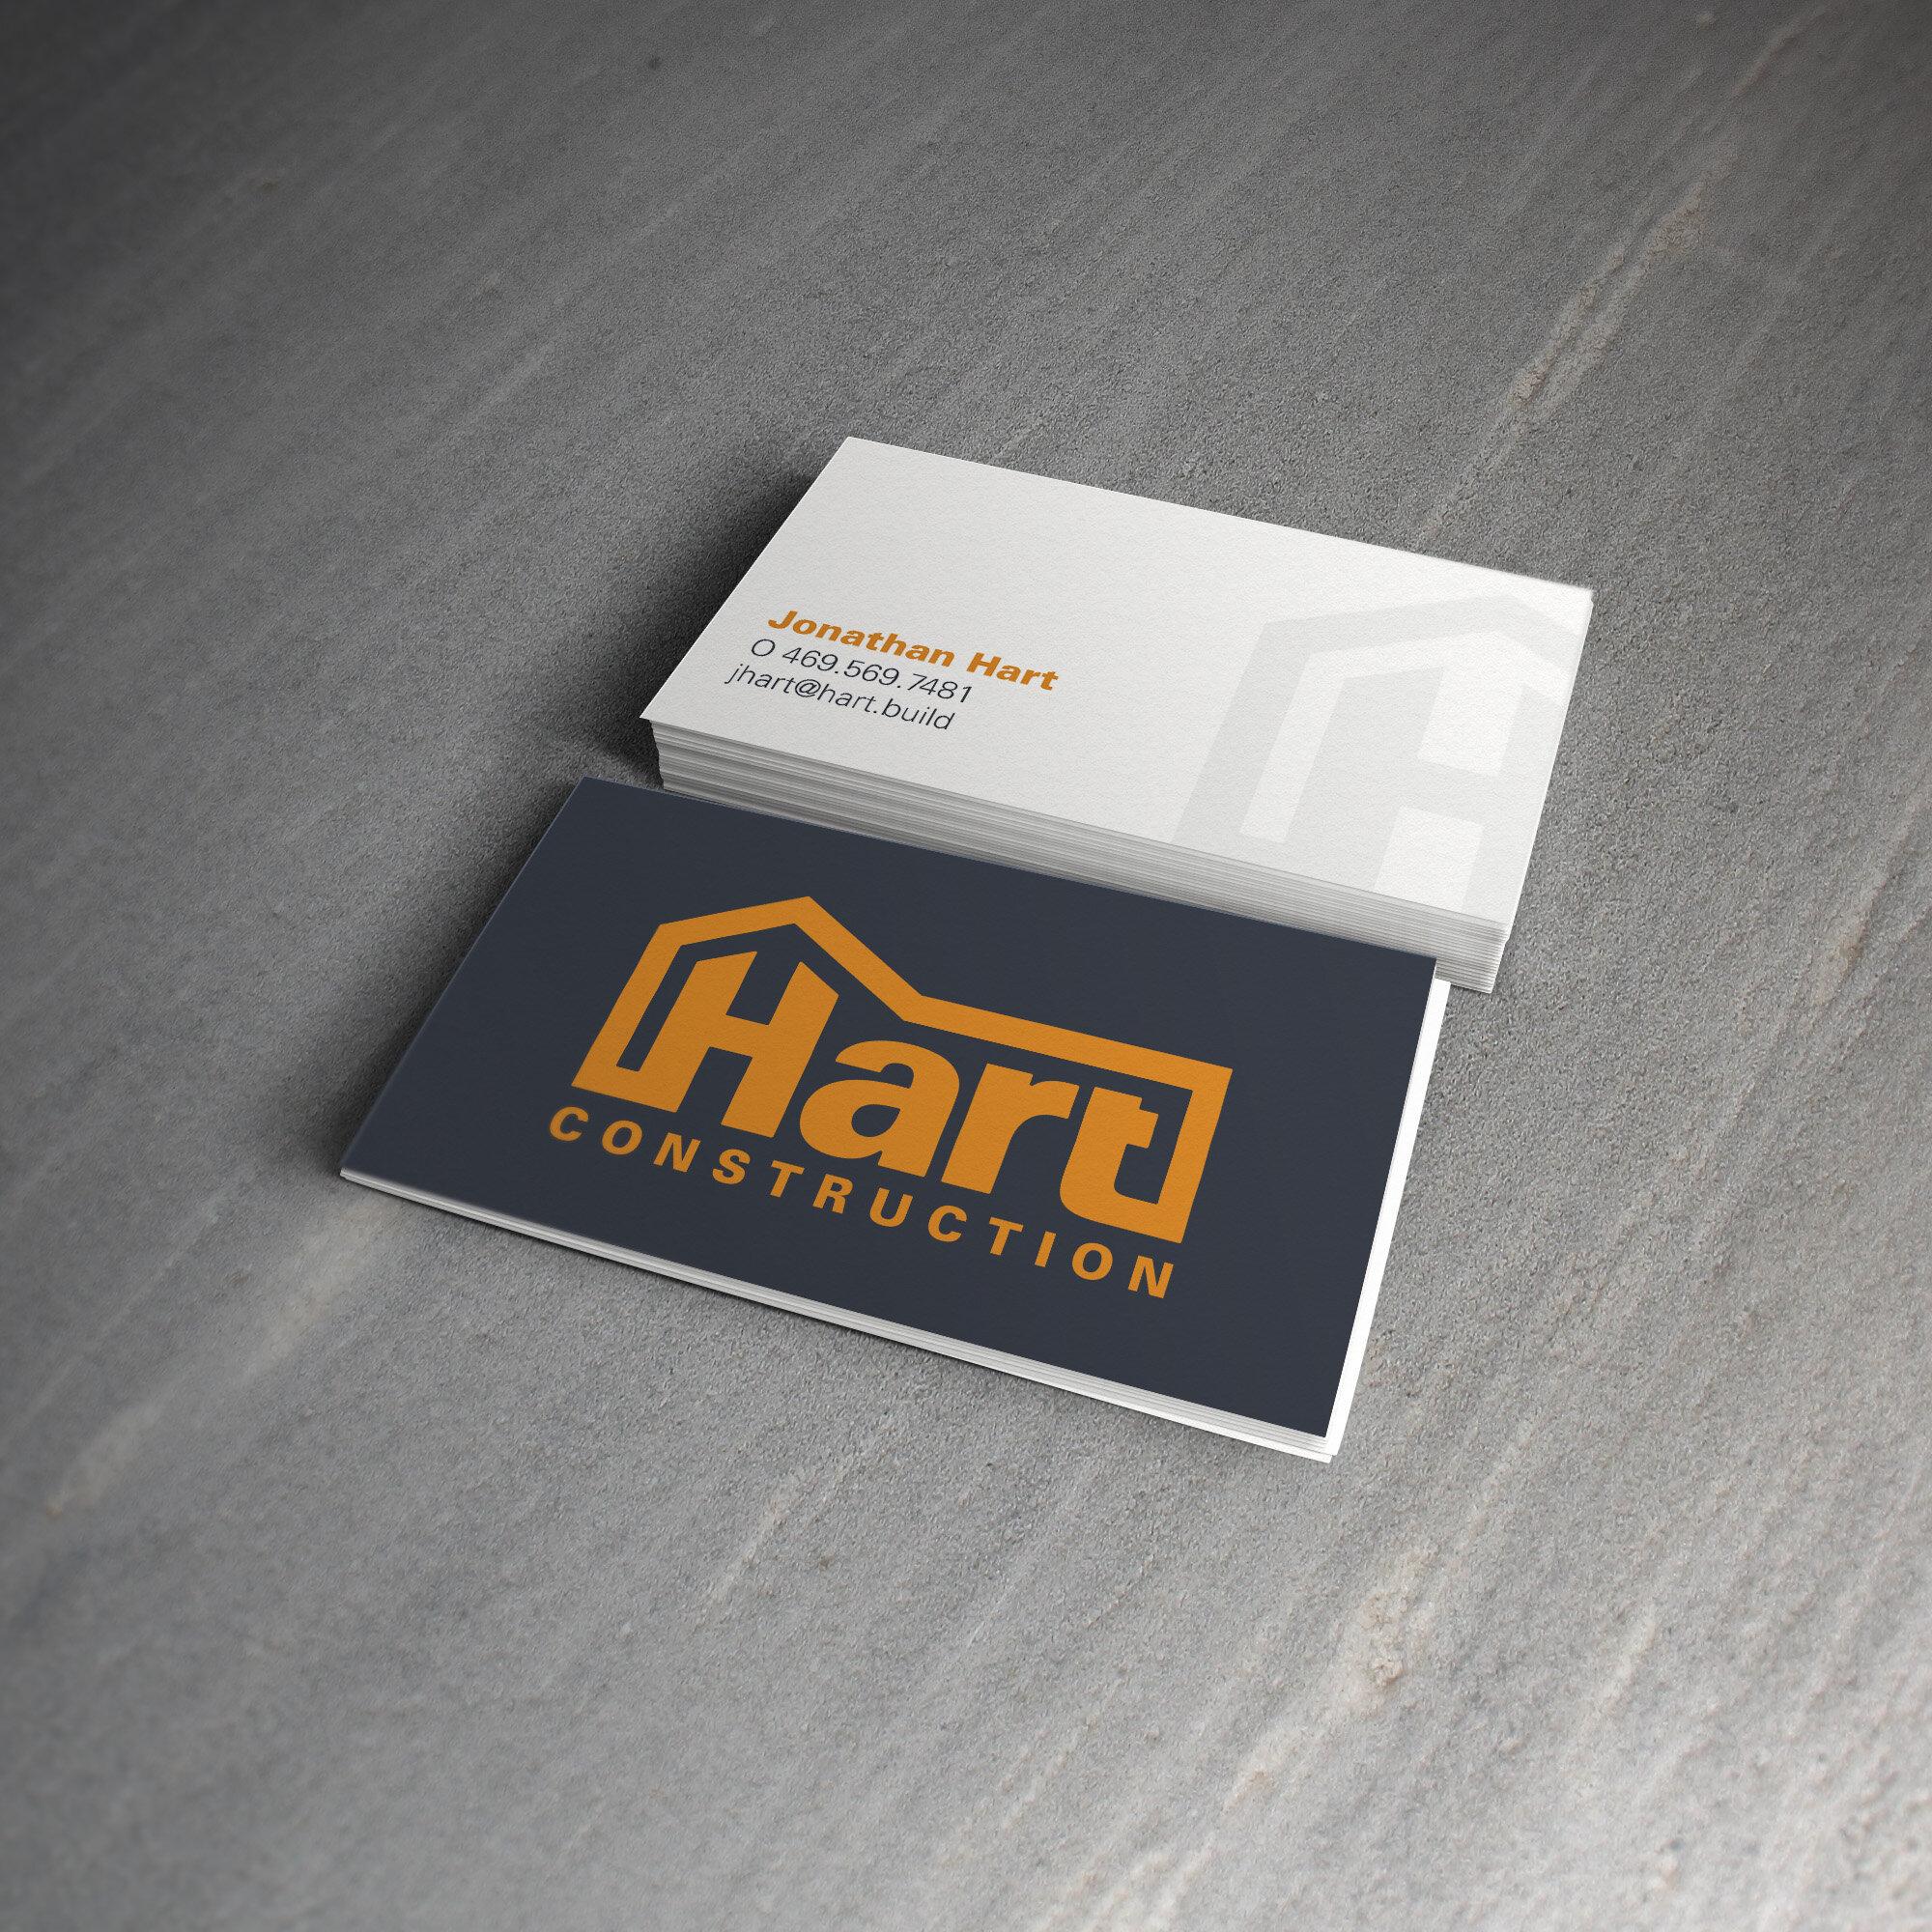 hart business card mock up 2_1013.jpg